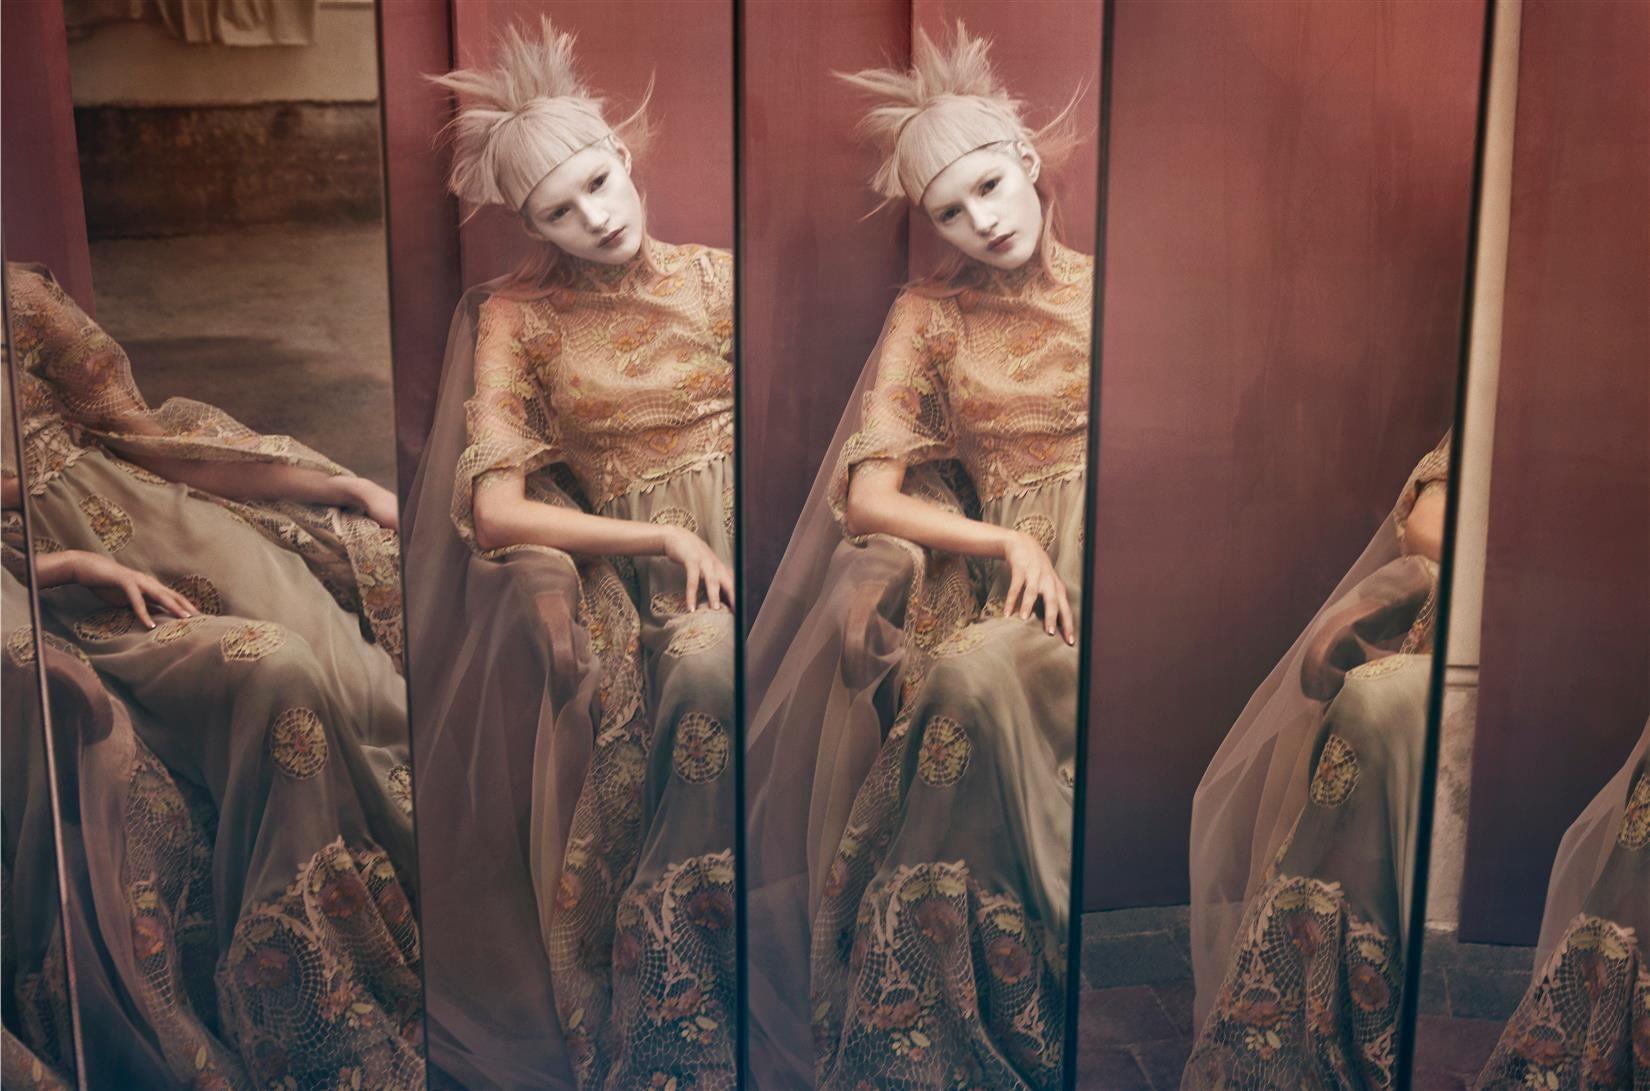 Publication: Vogue Italia March 2015 Model: Valery Kaufman Photographer: Sølve Sundsbø Fashion Editor: Patti Wilson Hair: Eugene Souleiman Make-up: Val Garland